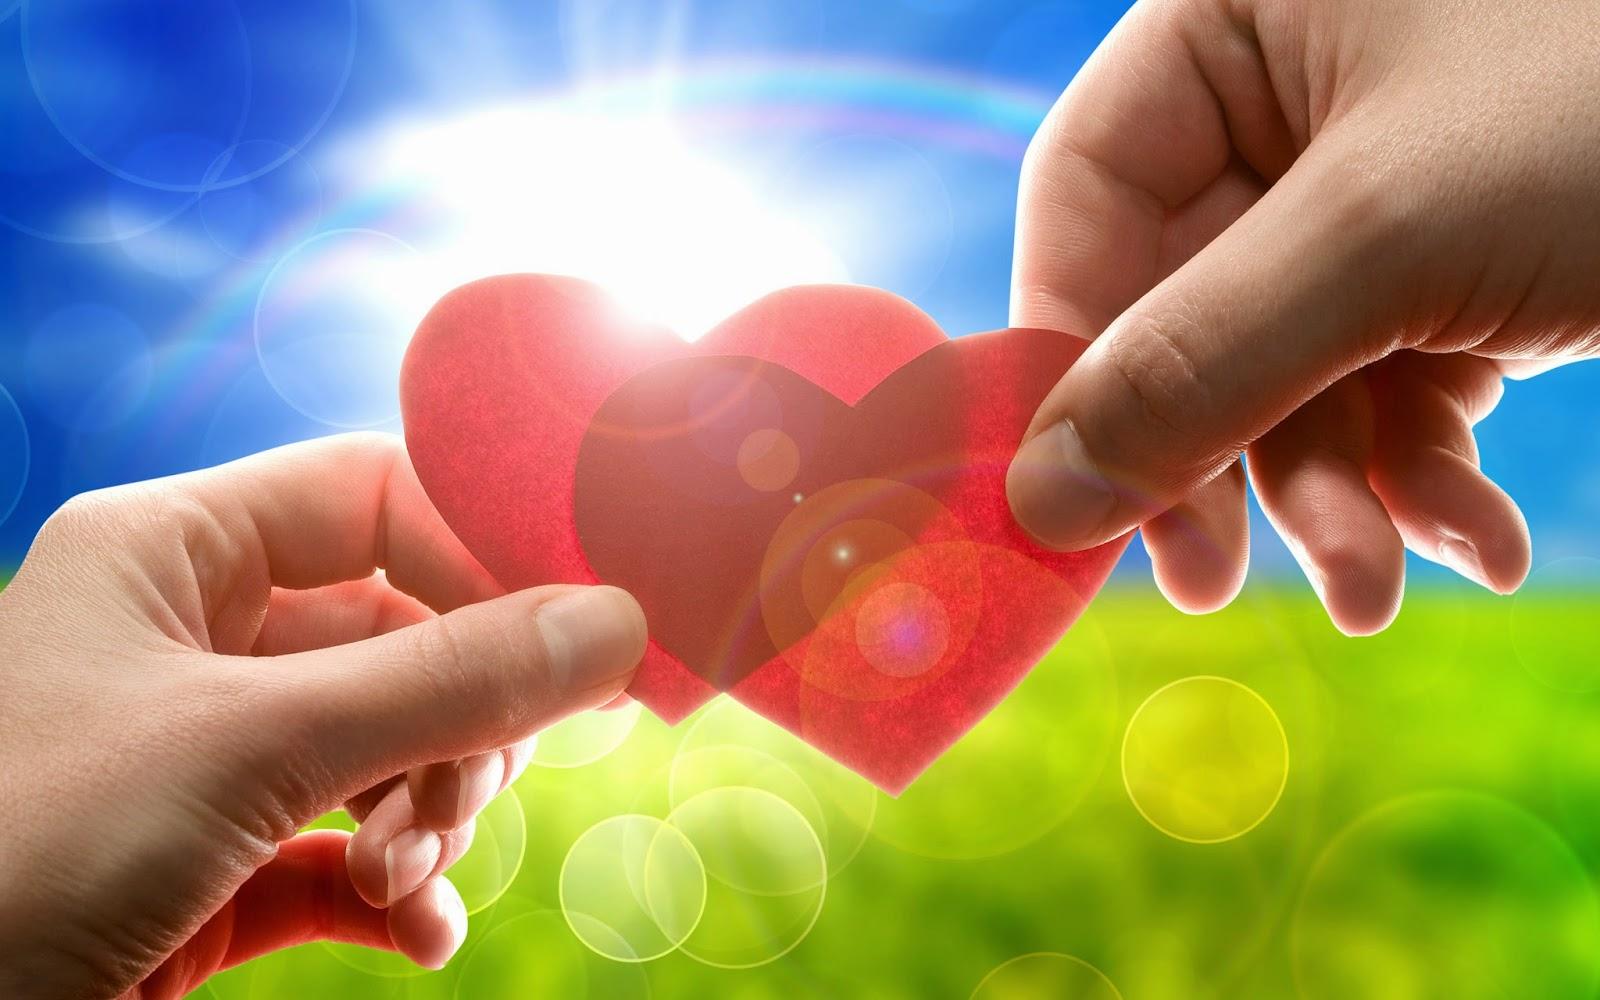 6 Tips Agar Asmara Menjadi Langgeng